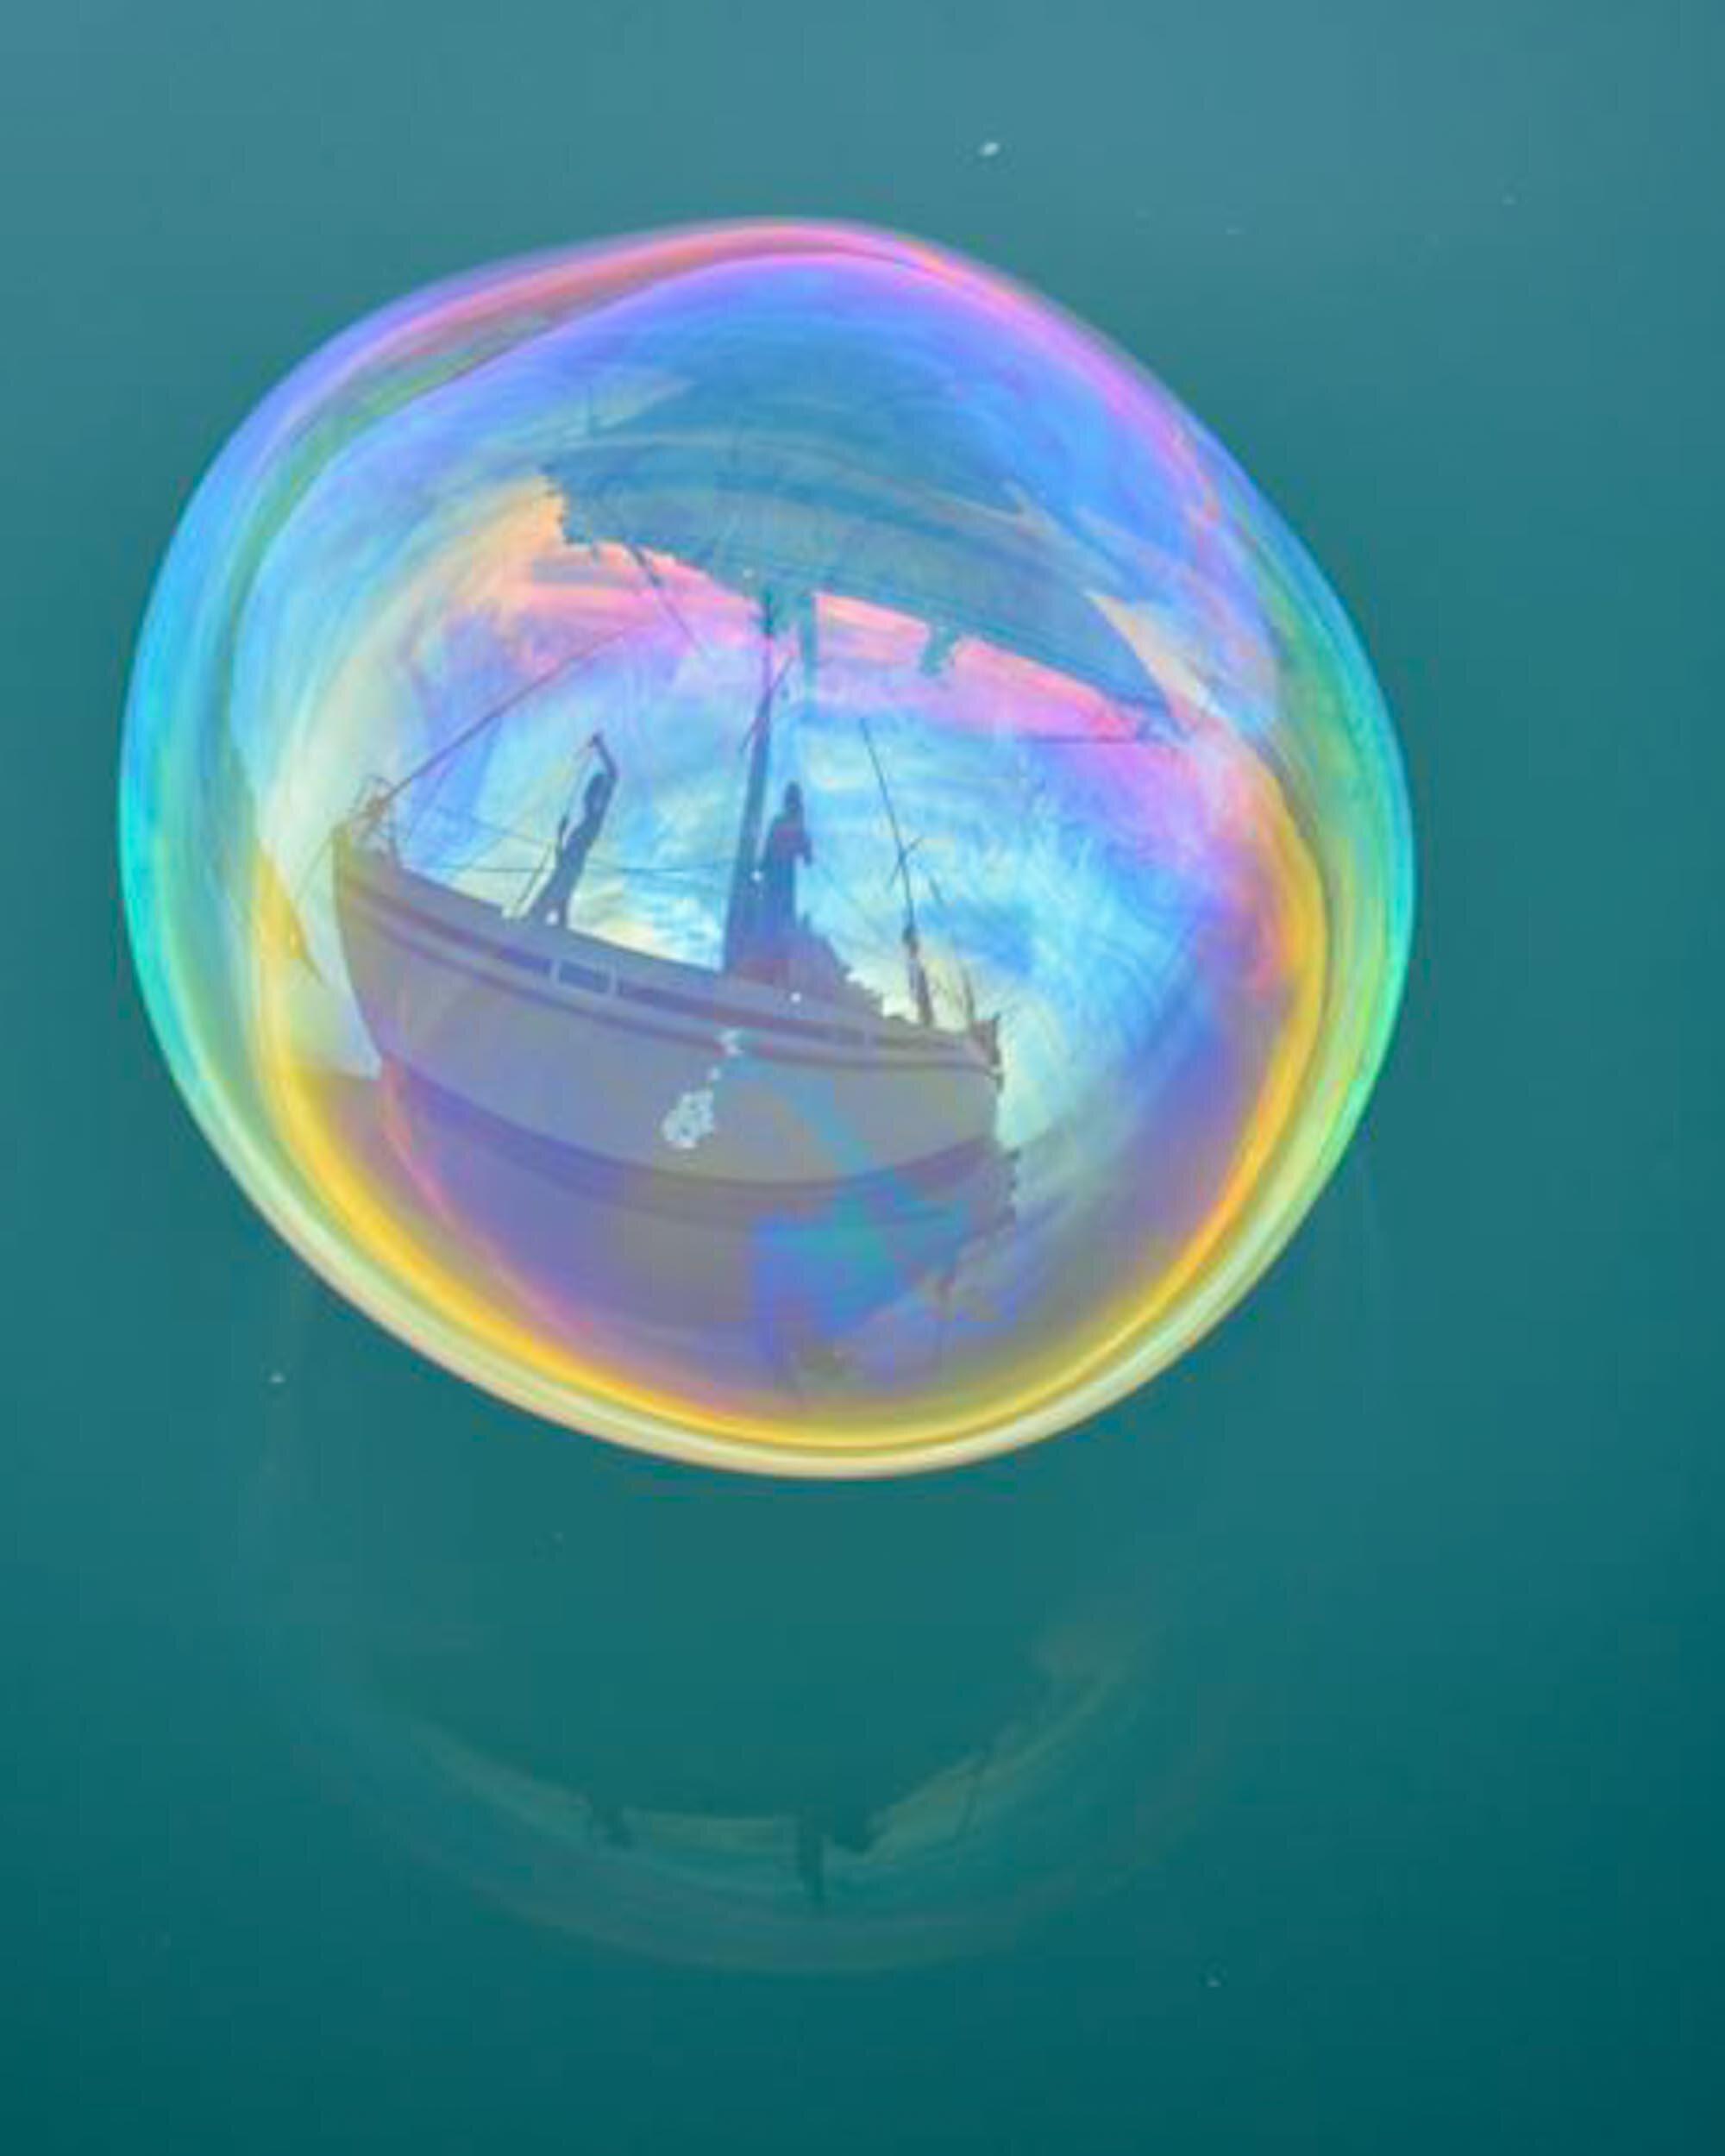 BethAMathews-Bubble-Sailboat_2763.jpg